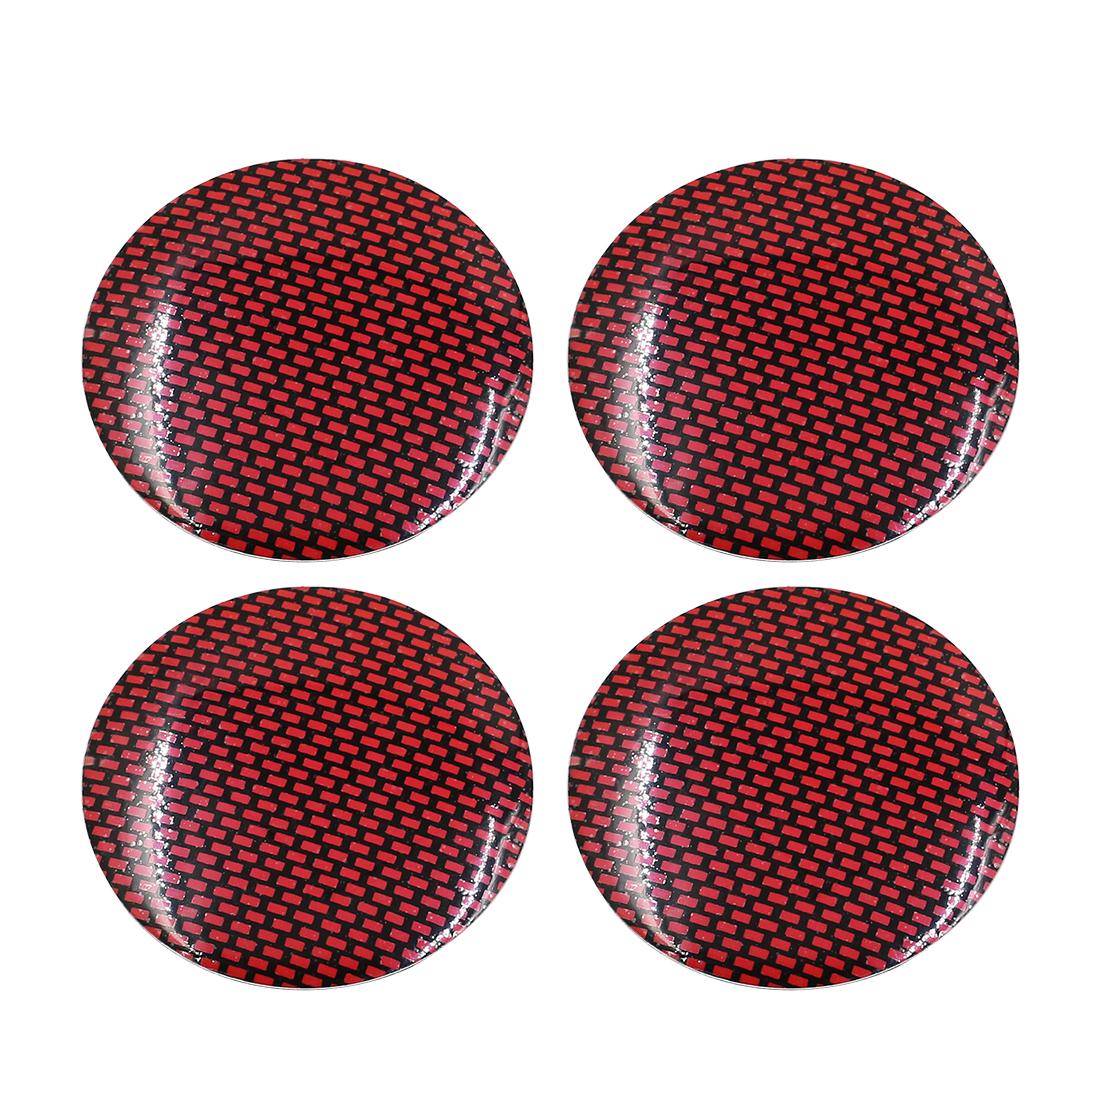 56mm Dia Car Wheel Center Cap Sticker Carbon Fiber Red Pattern 4pcs